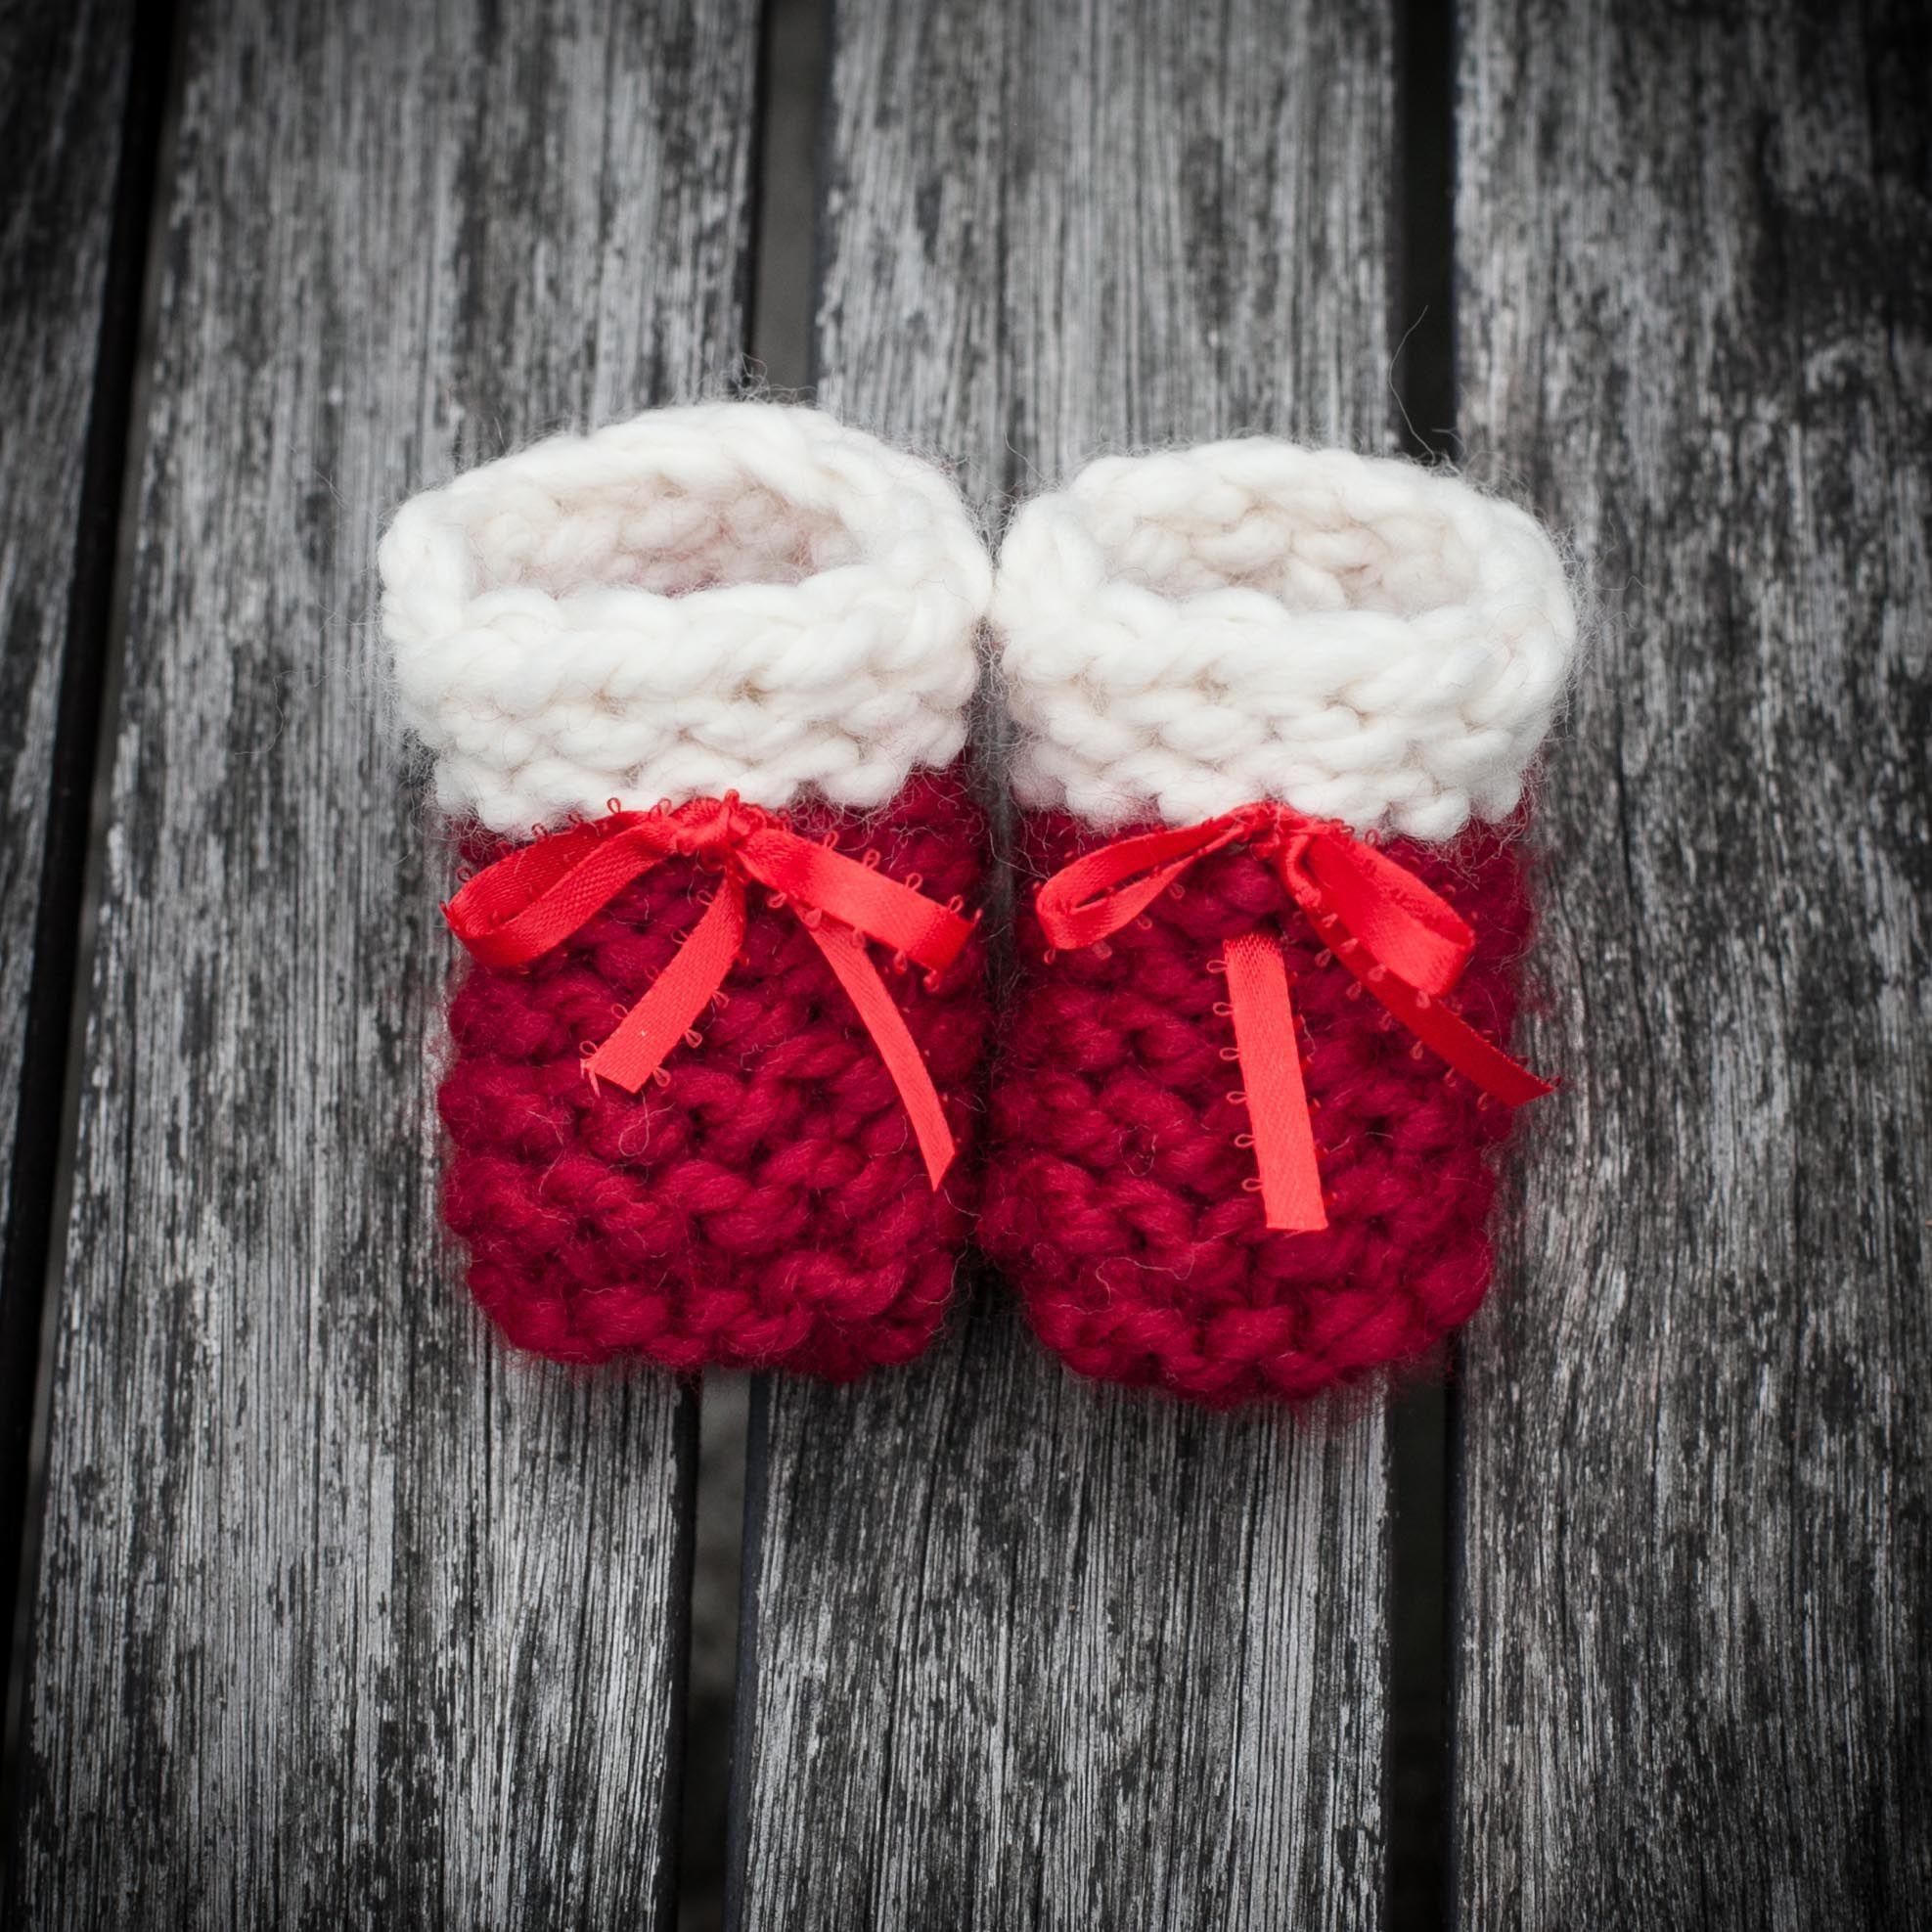 Loom Knit Baby Booties Shoes PATTERN Beginner Friendly Garter